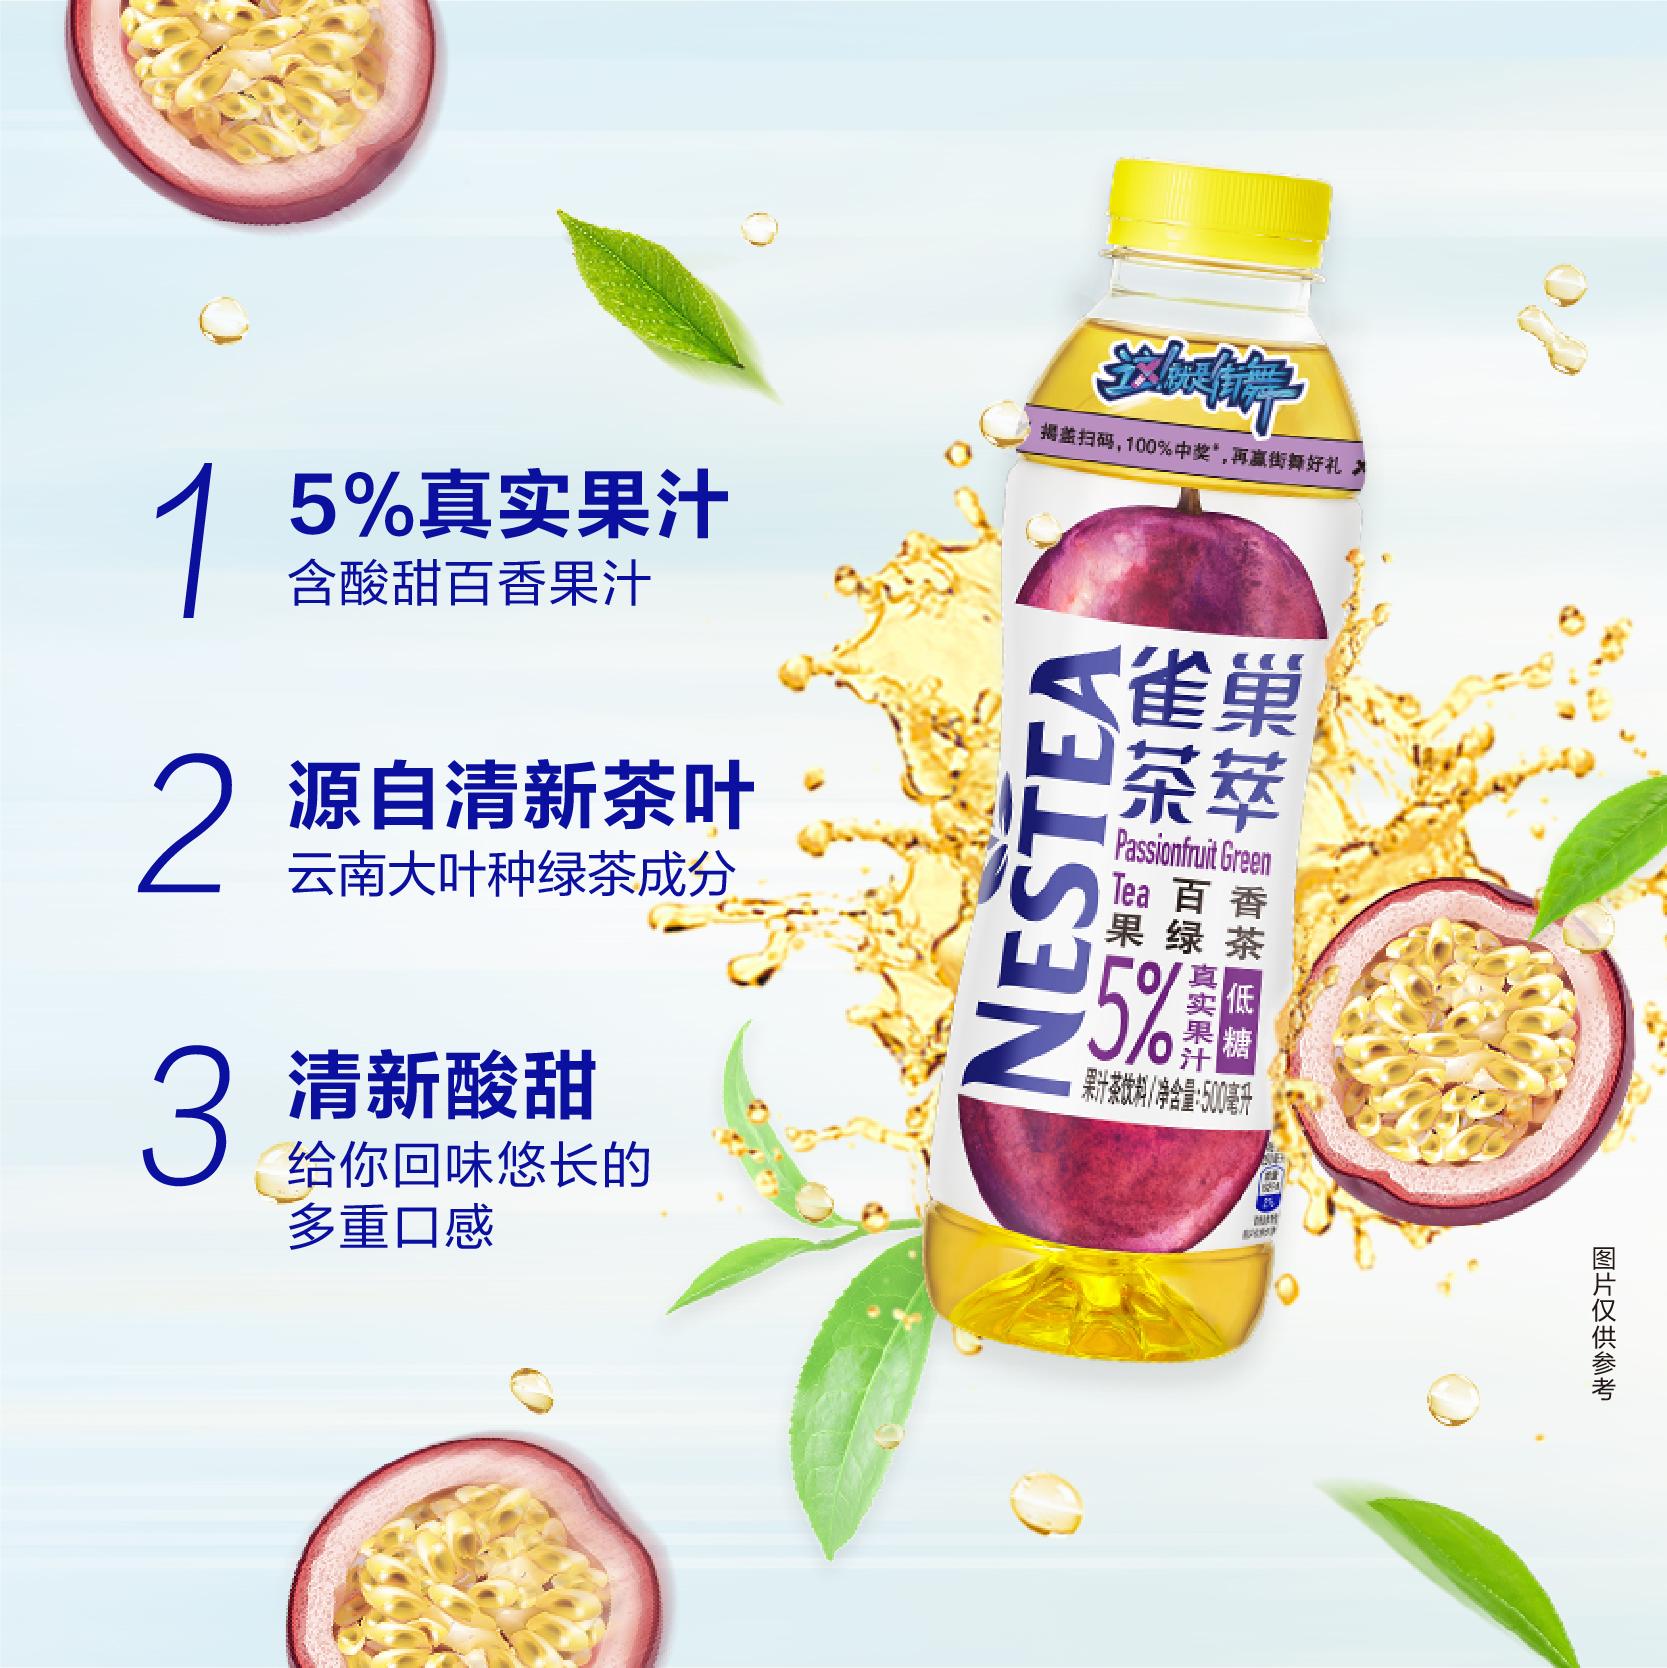 Nestle 雀巢 茶萃 百香果绿茶饮料 500ml*8瓶 天猫优惠券折后¥29.9包邮(¥39.9-10)